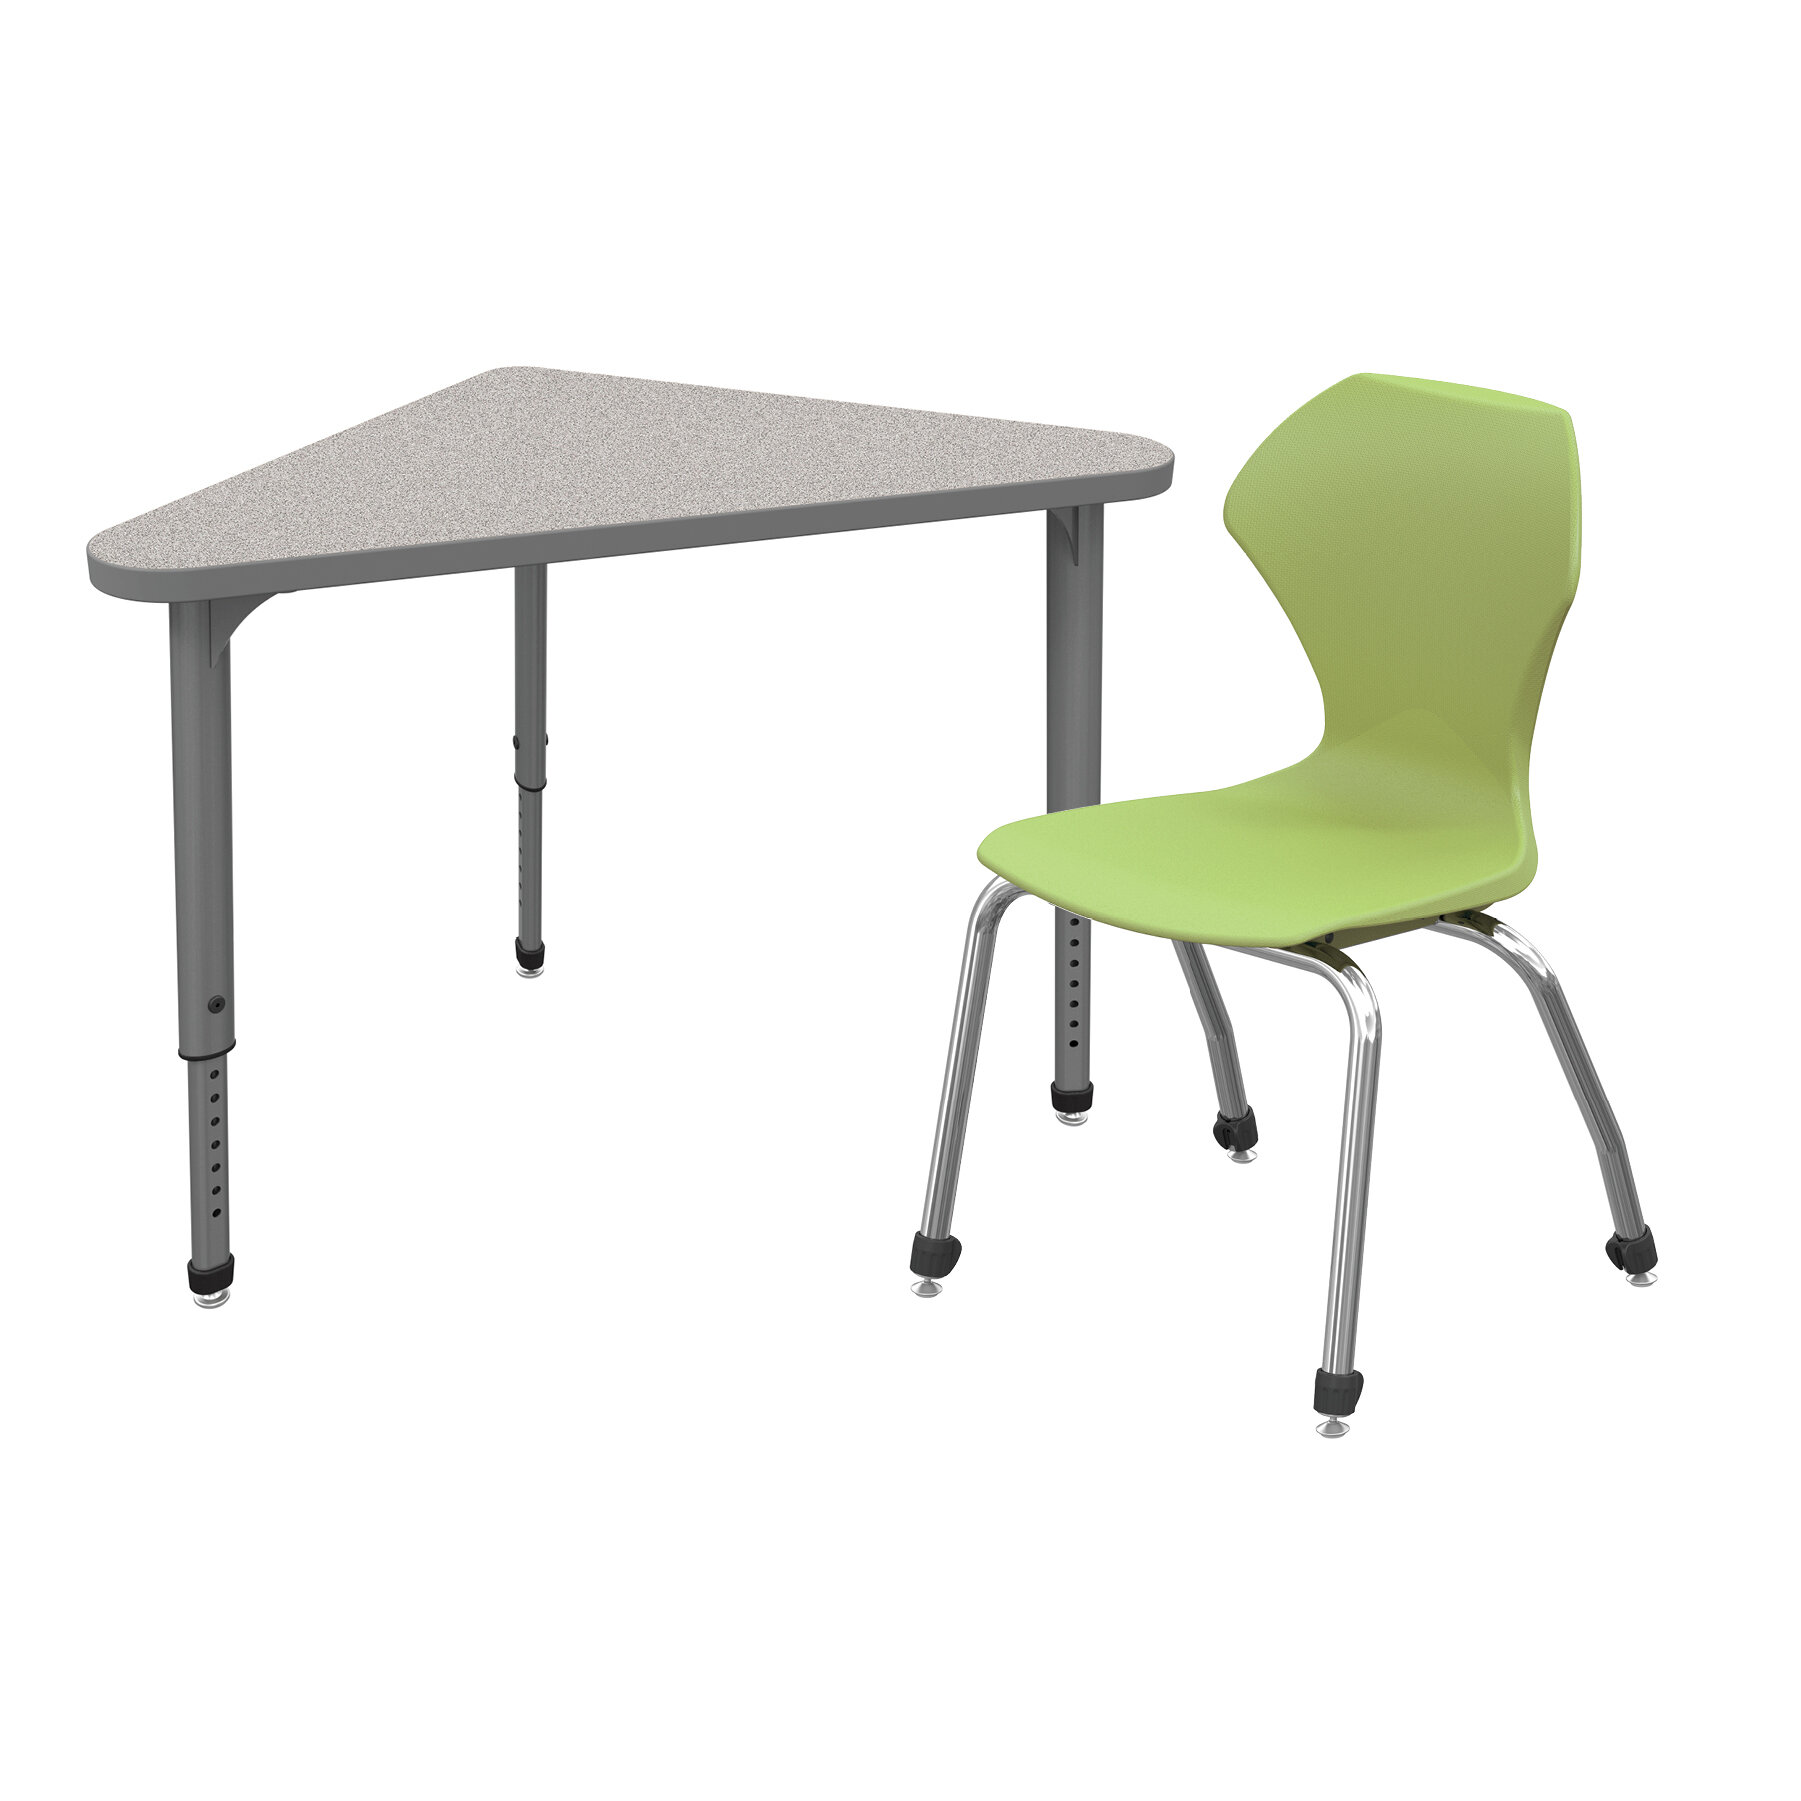 Marco Group Apex Classroom Desk U0026 Chair Set: 12 Wood Adjustable Height  Triangle Desks U0026 12 Chairs | Wayfair